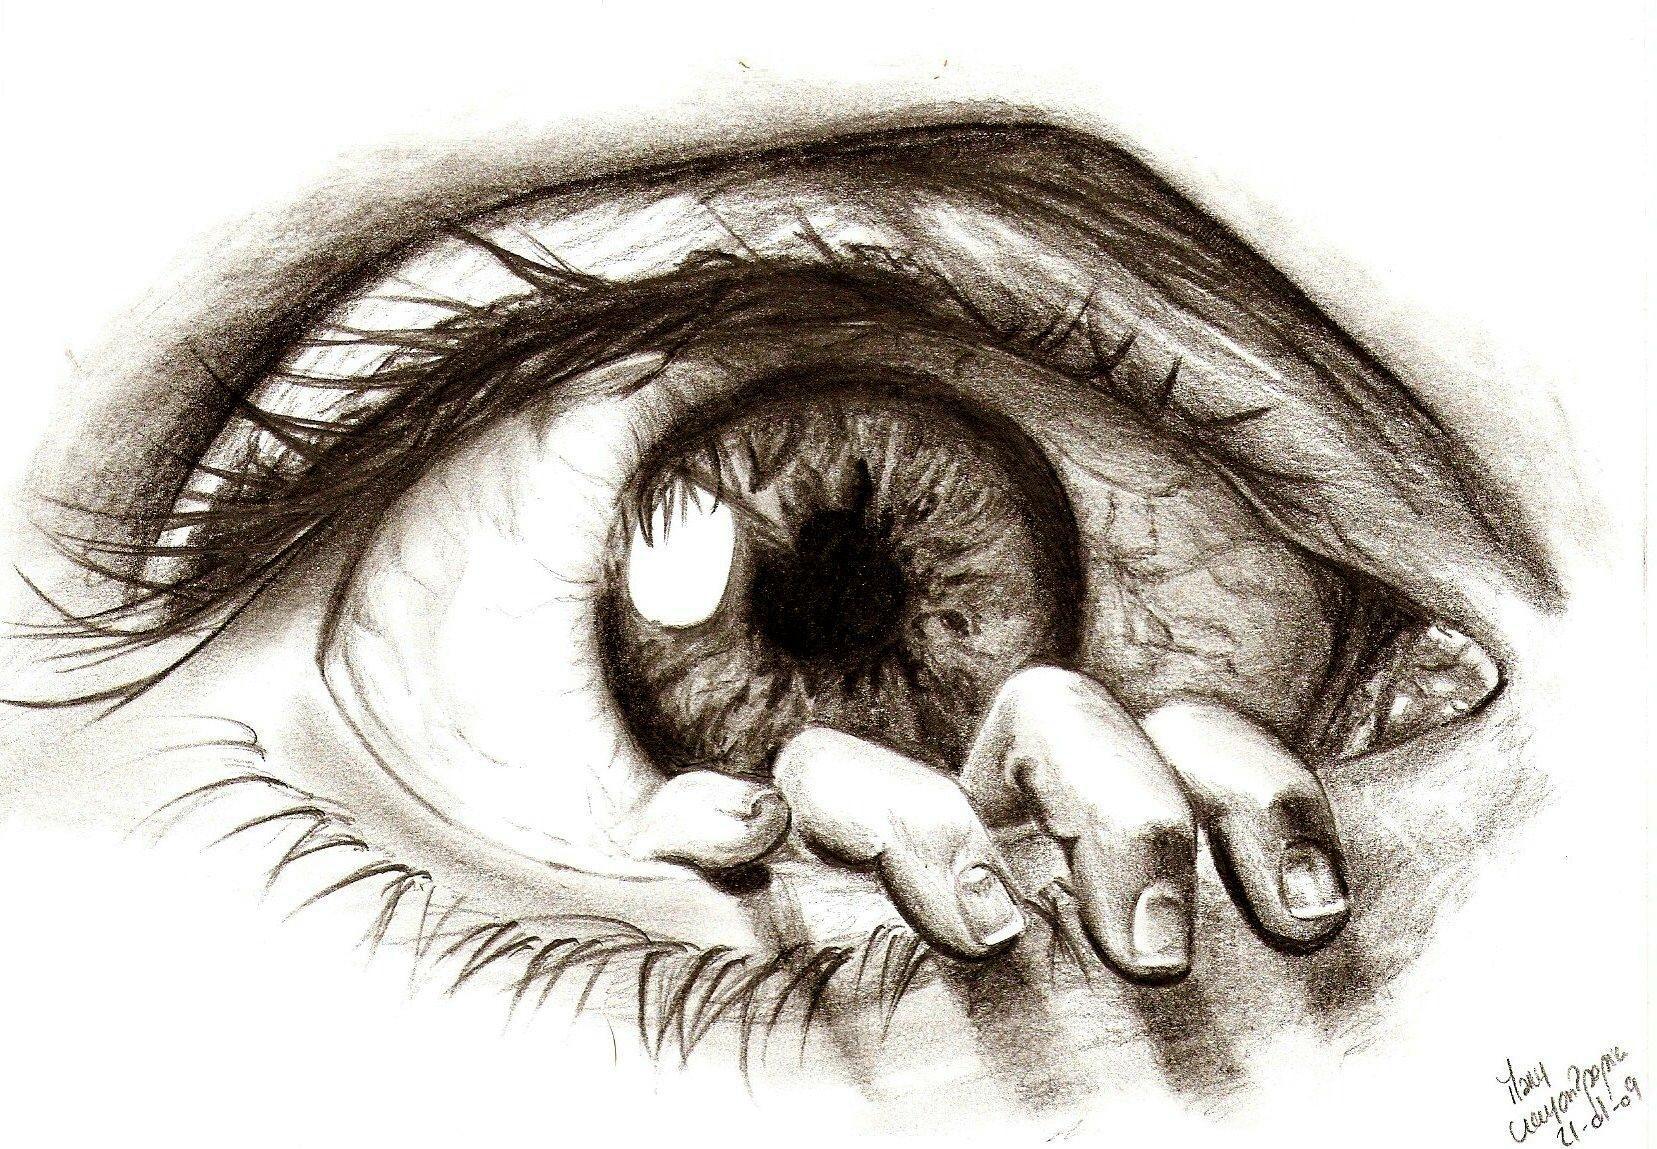 Creative+Drawings   30 Beautiful eye macros, drawings and manipulations   #1 Design Utopia ...